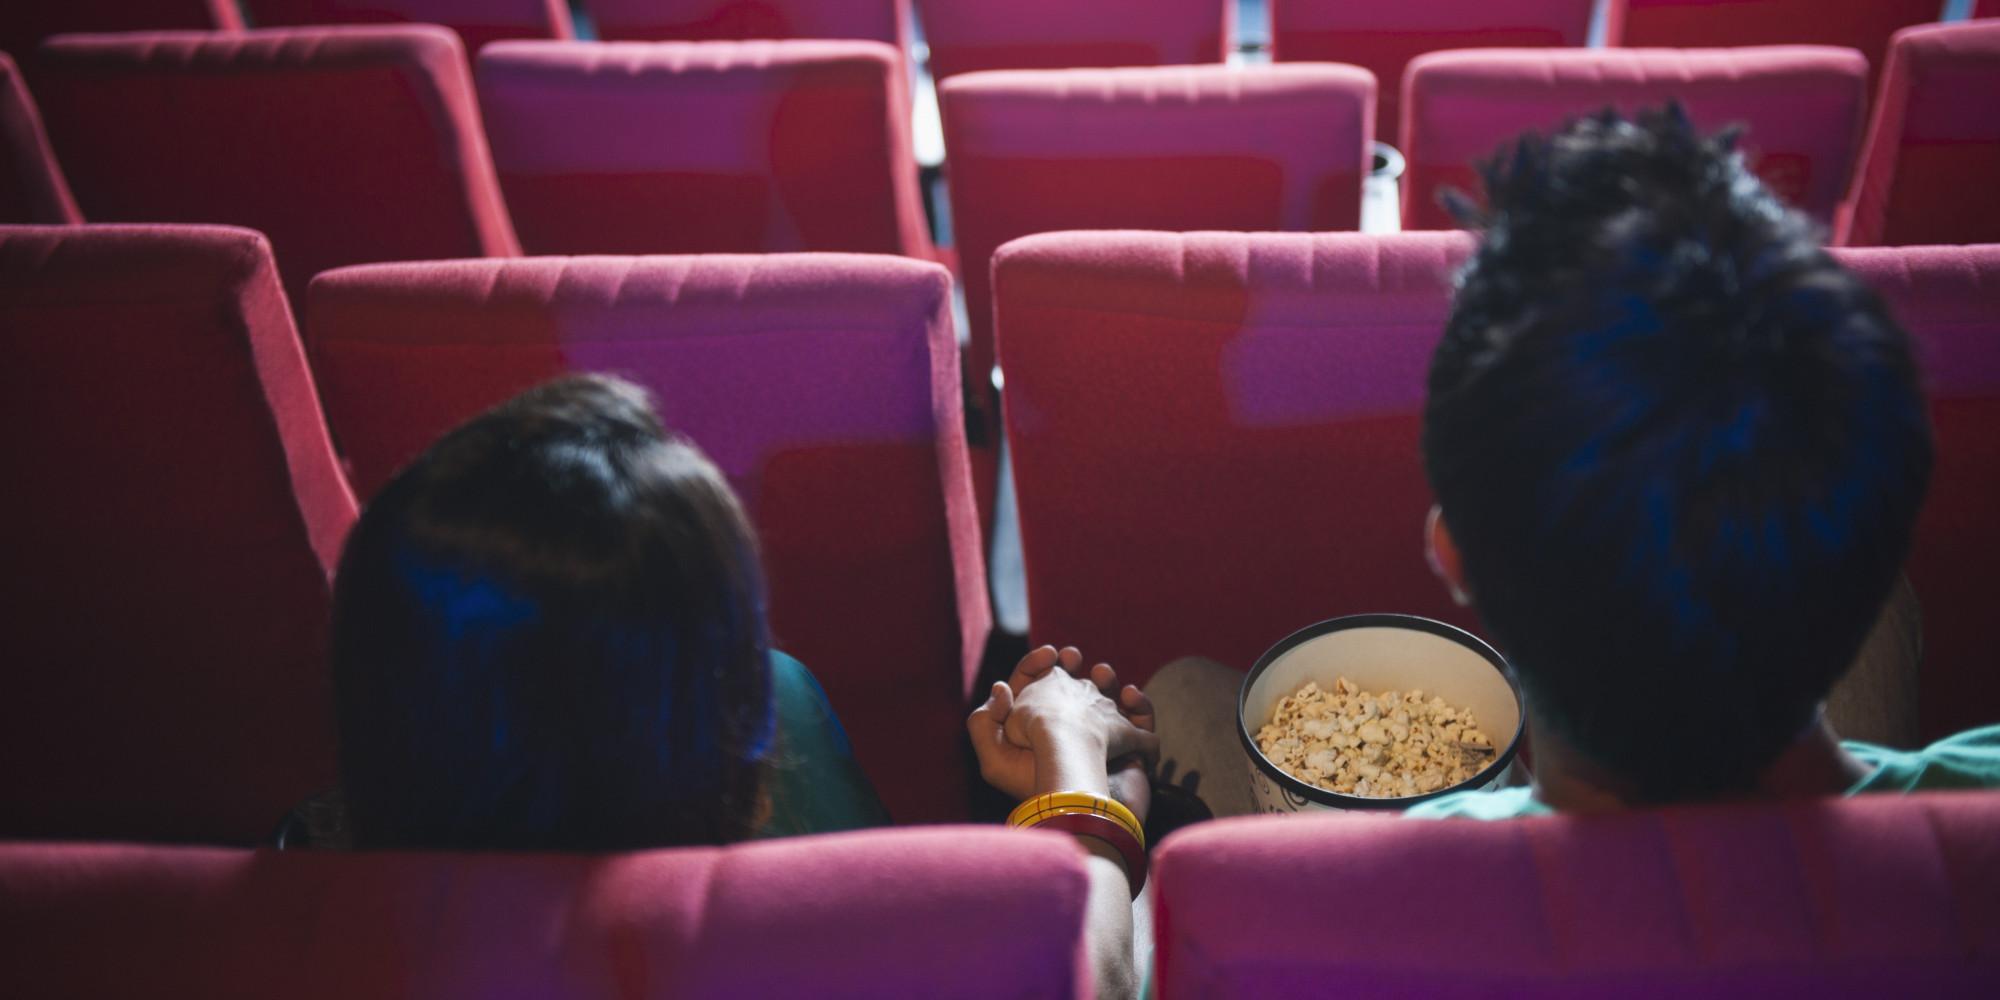 Couple enjoying movie with popcorns in a cinema hall